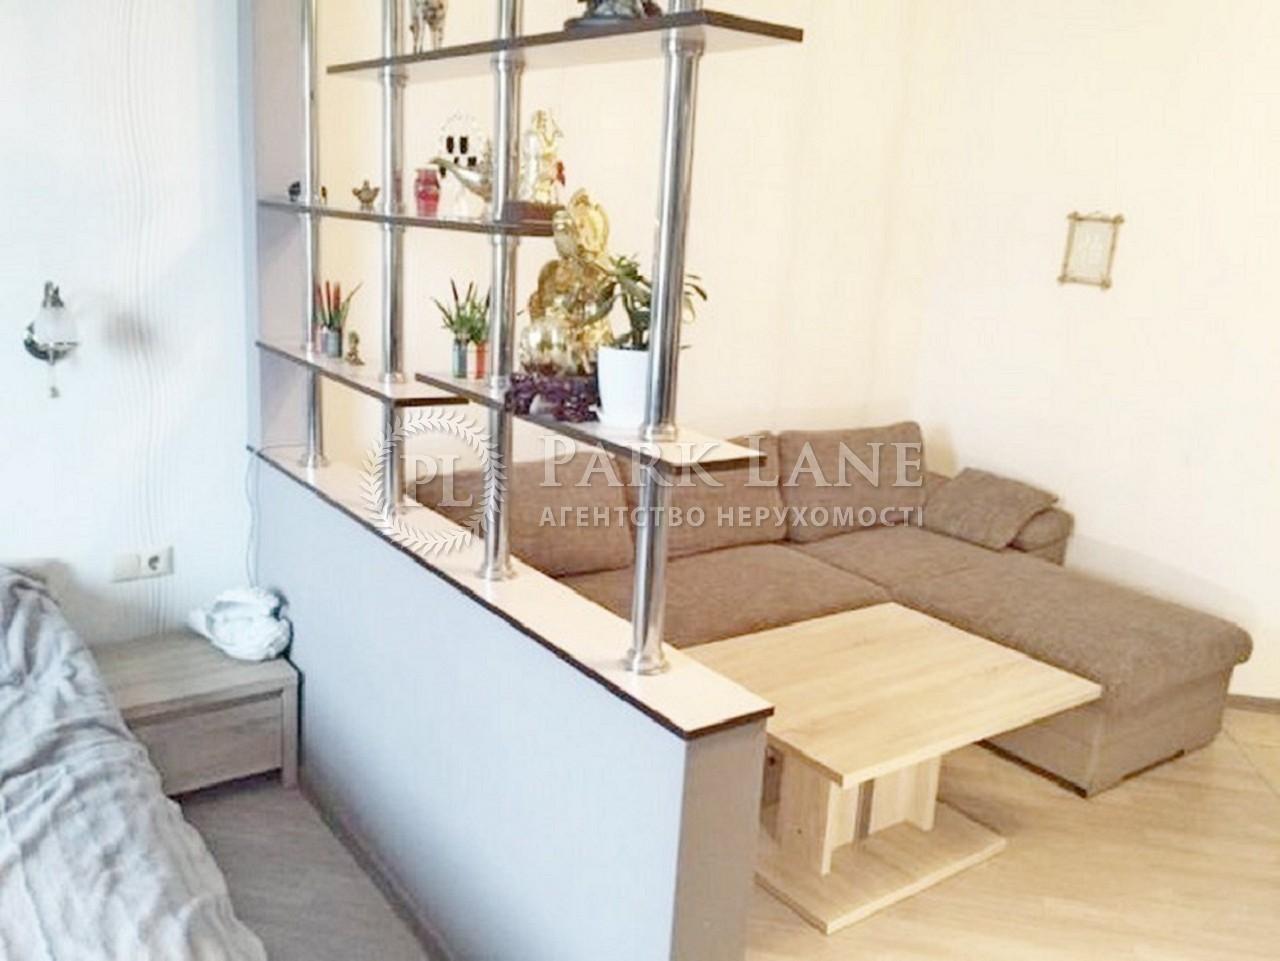 Квартира ул. Иорданская (Гавро Лайоша), 1, Киев, Z-275930 - Фото 6